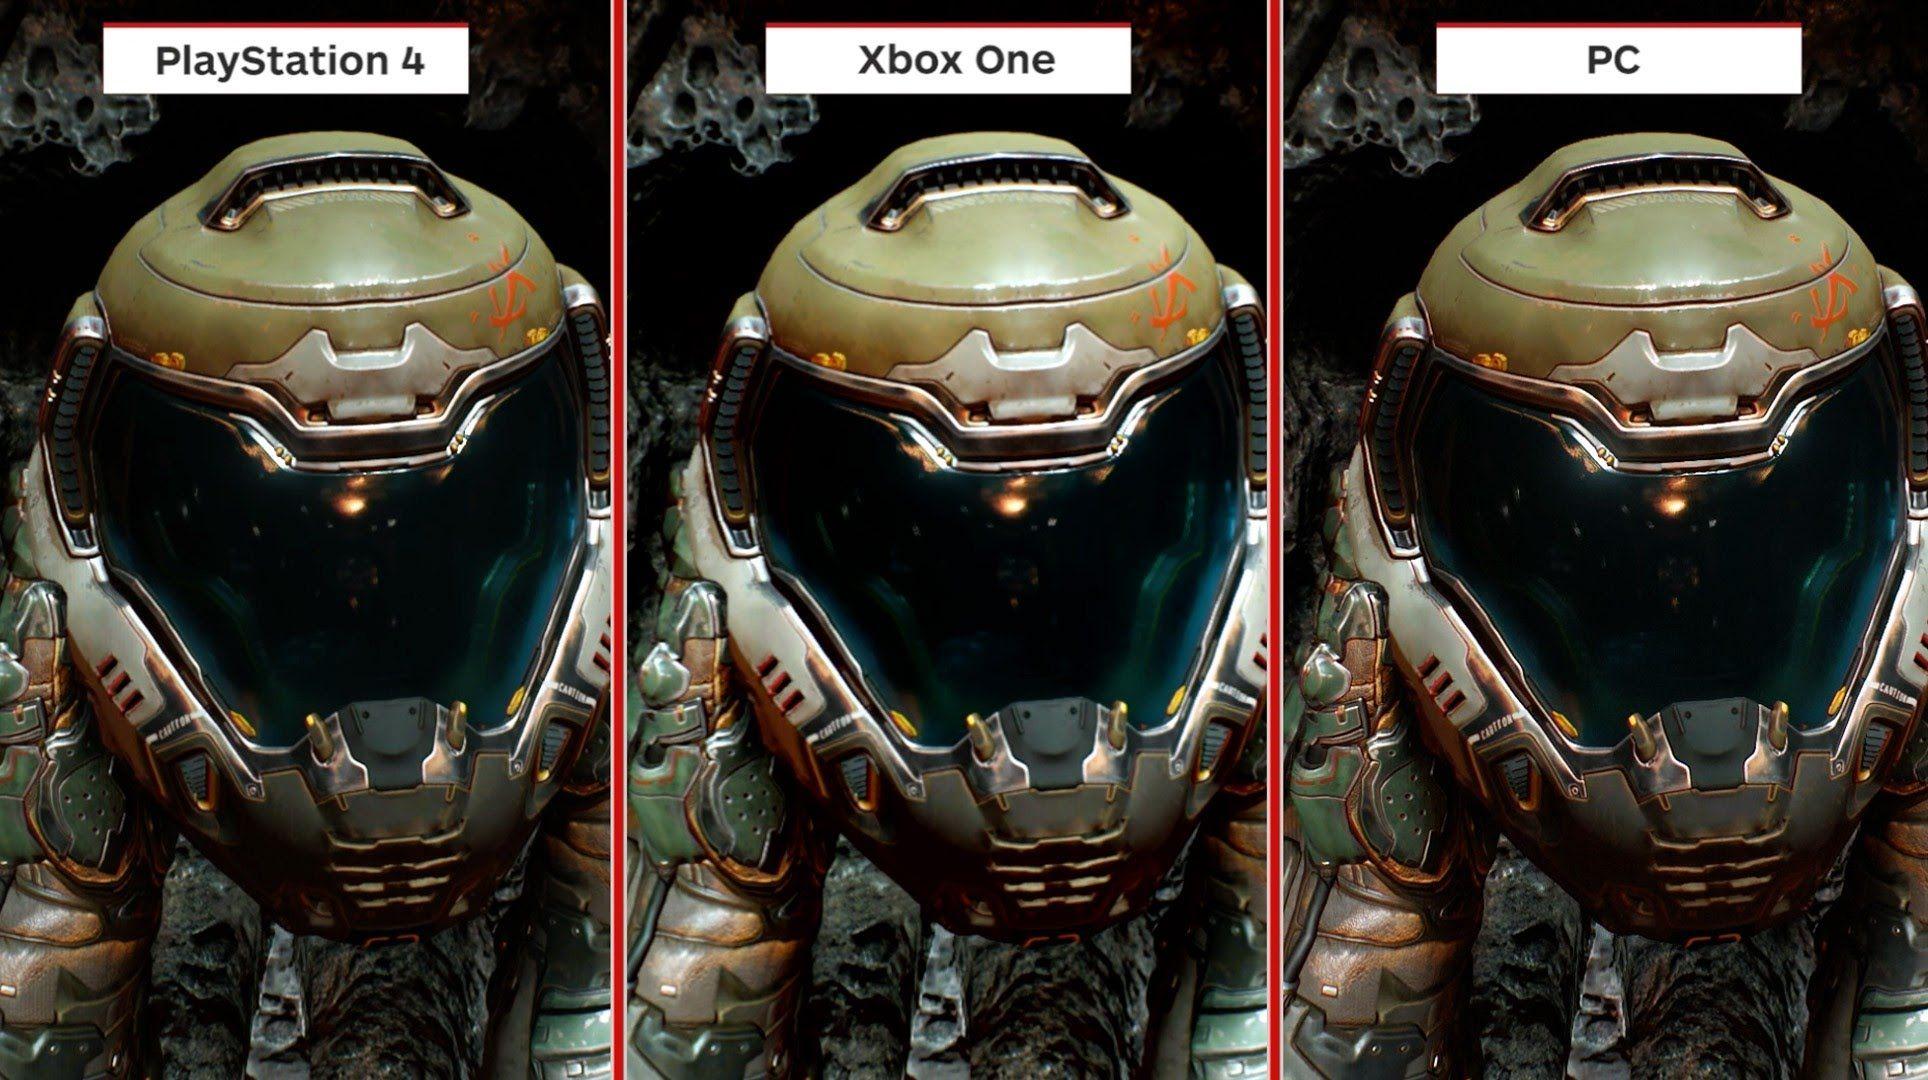 Doom Graphics Comparison Pc Vs Xbox One Vs Ps4 Hub Youtube Xbox One Xbox Doom